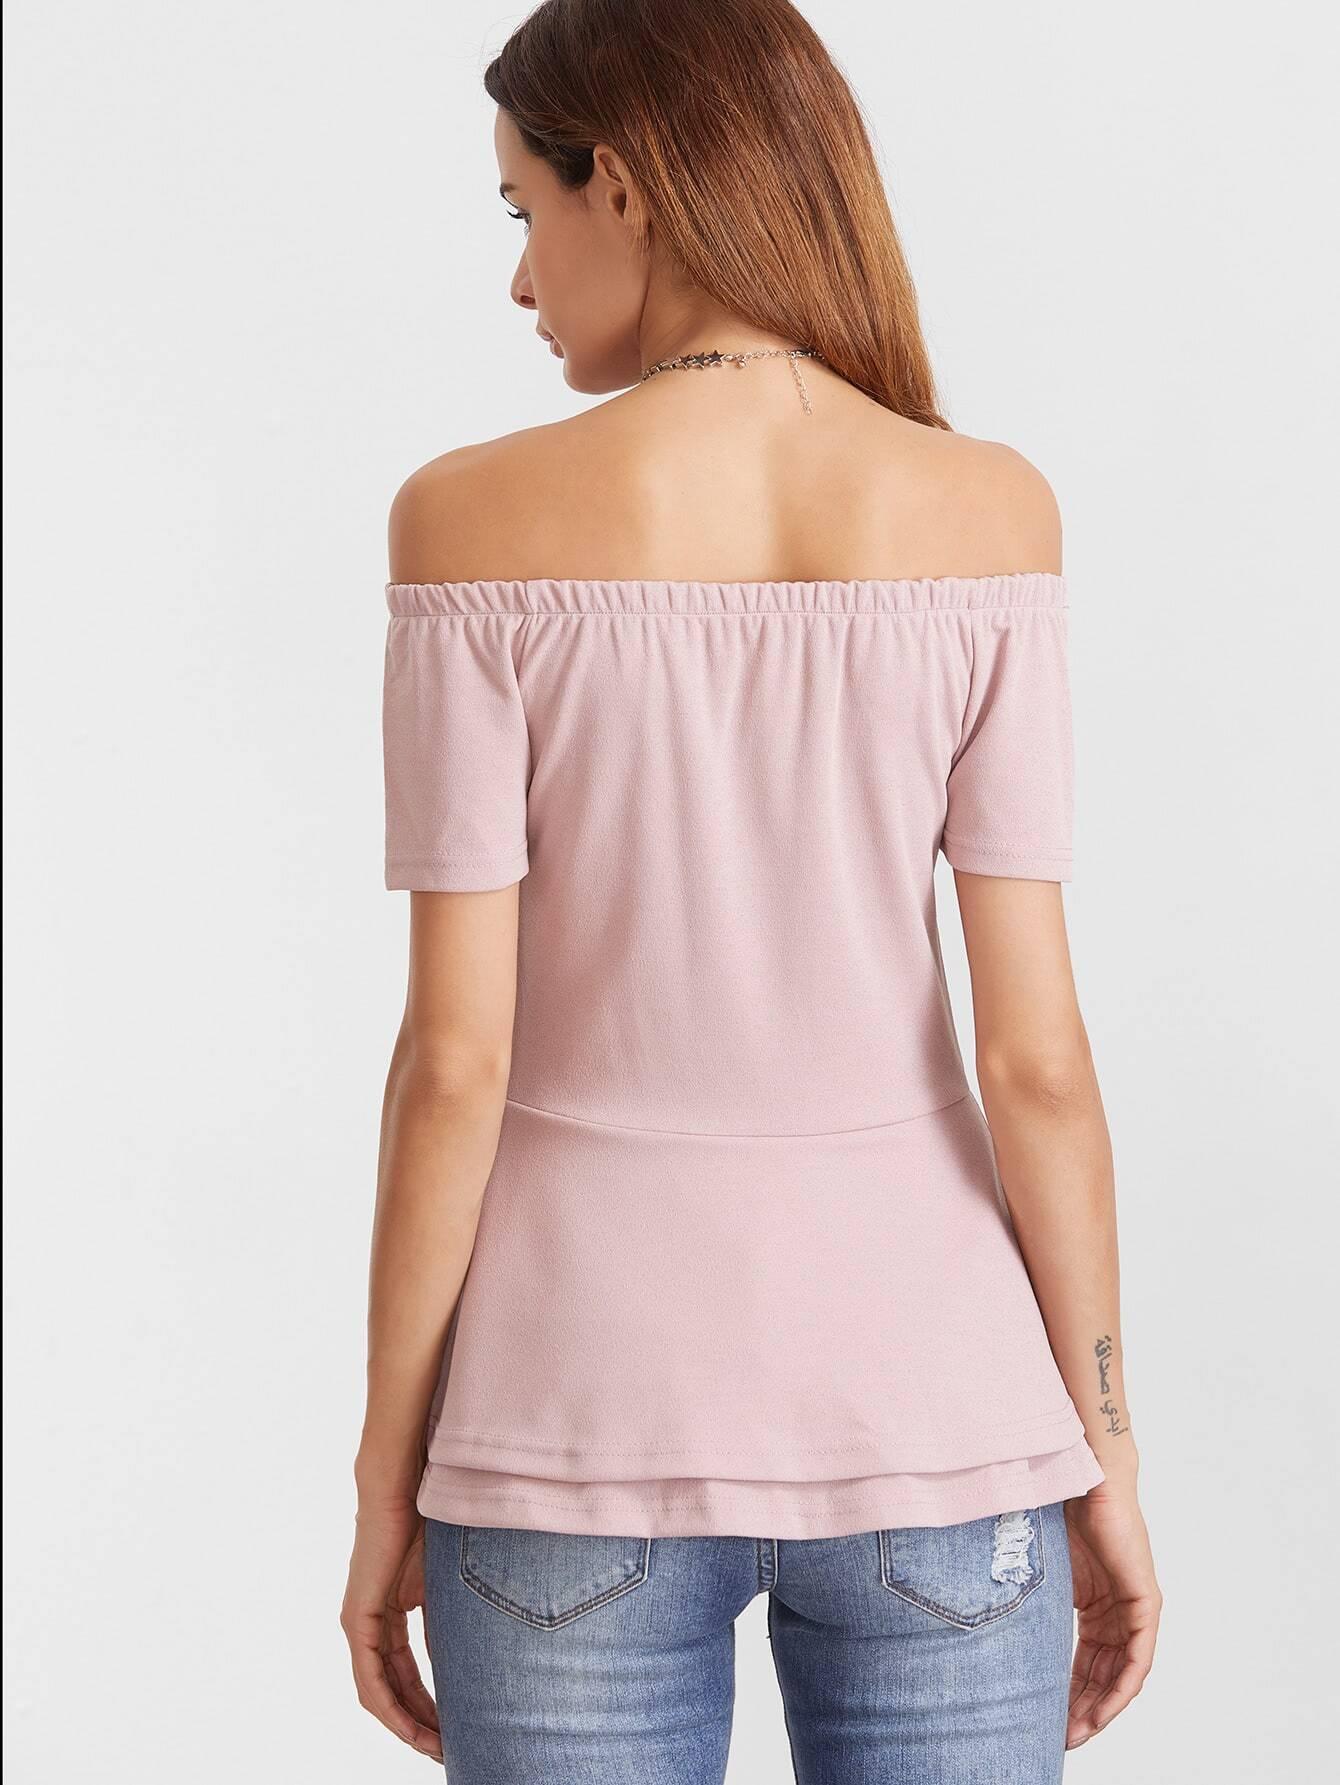 blouse161219491_2